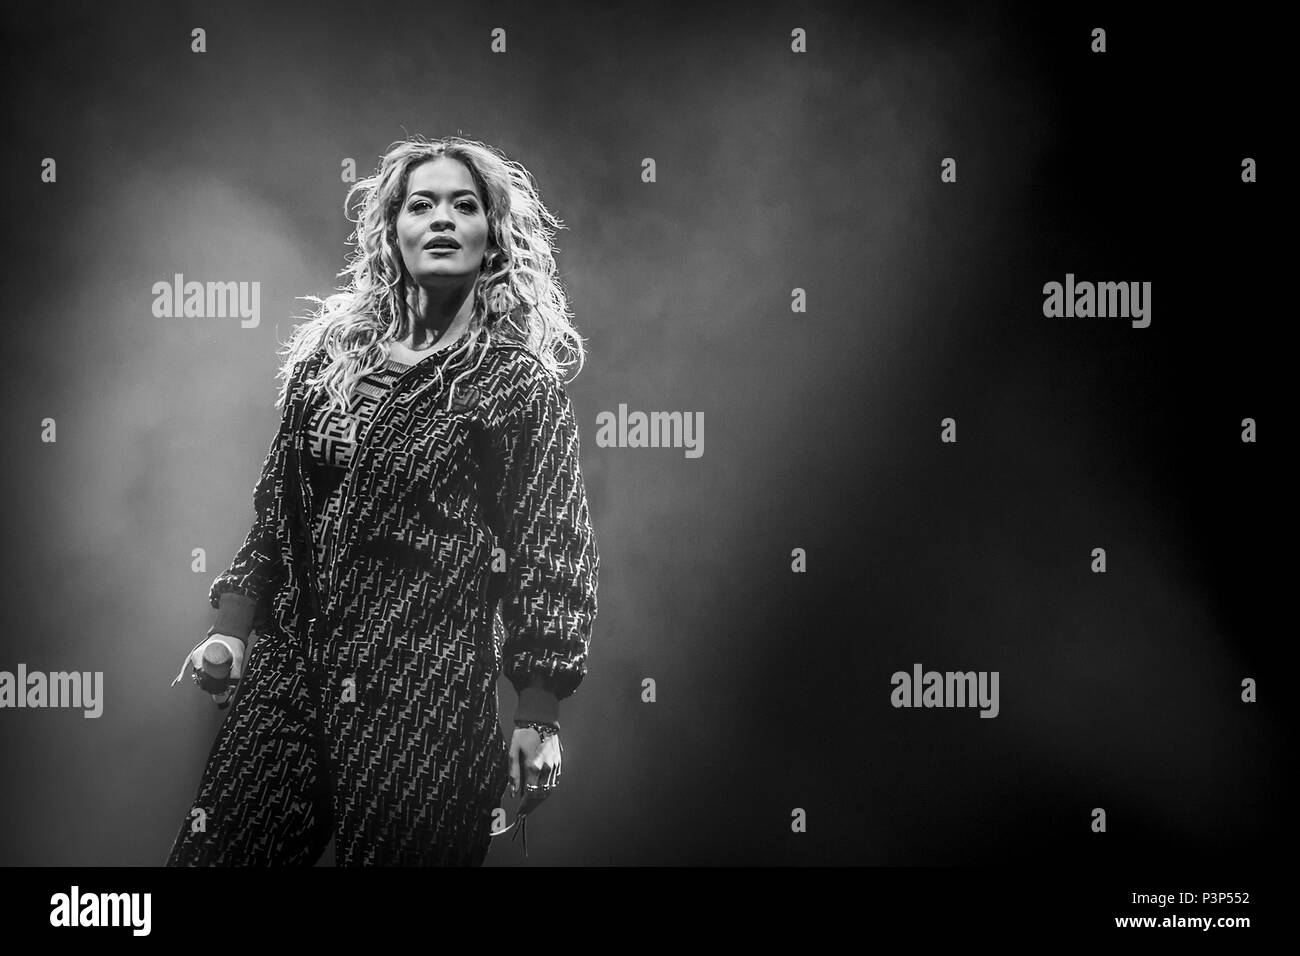 Rita Ora Girls Tour at Brixton Academy  Featuring: Rita Ora Where: London, United Kingdom When: 18 May 2018 Credit: Neil Lupin/WENN Stock Photo